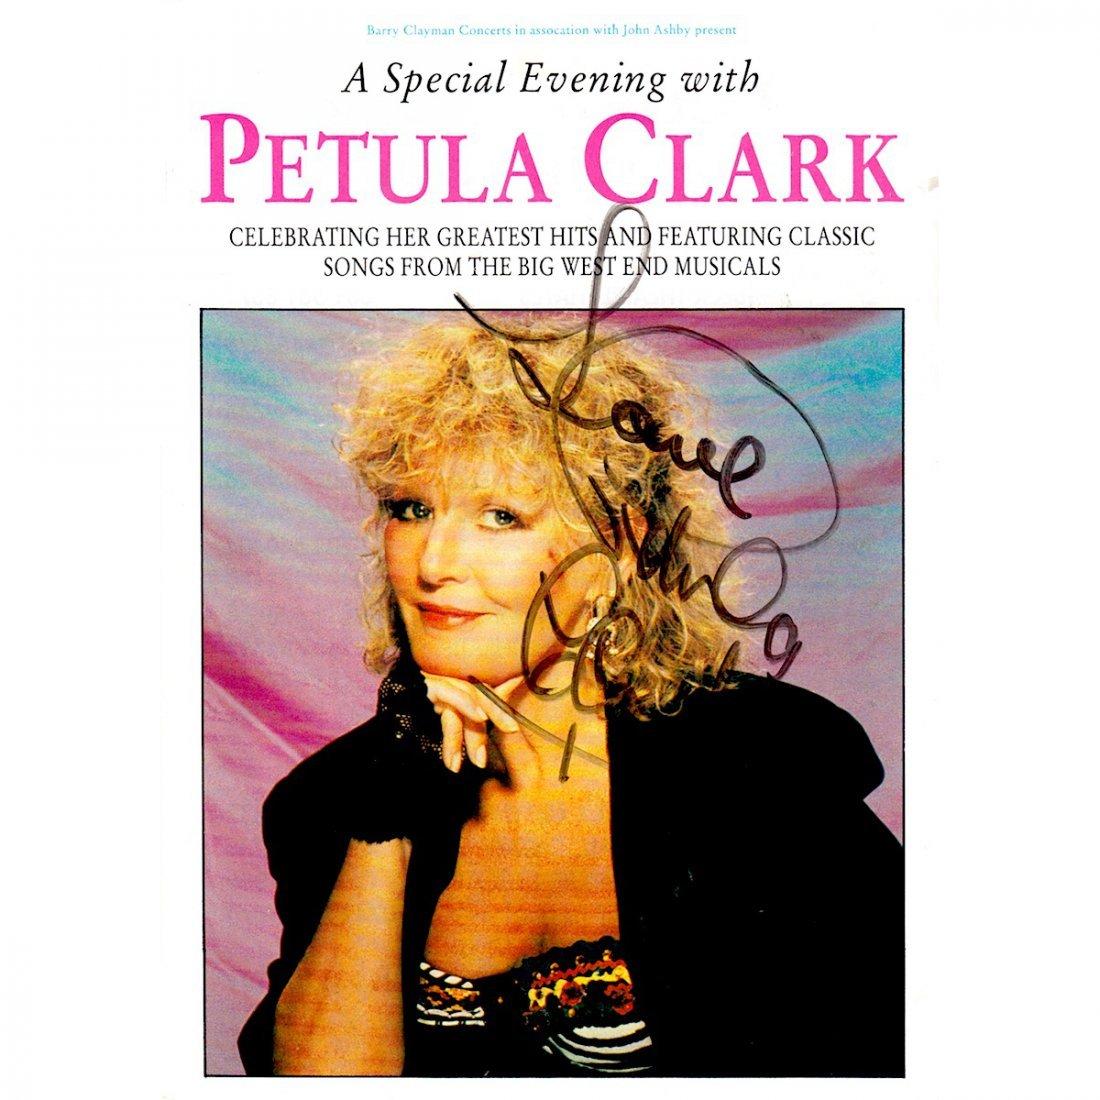 Petula Clark Autographed Handbill